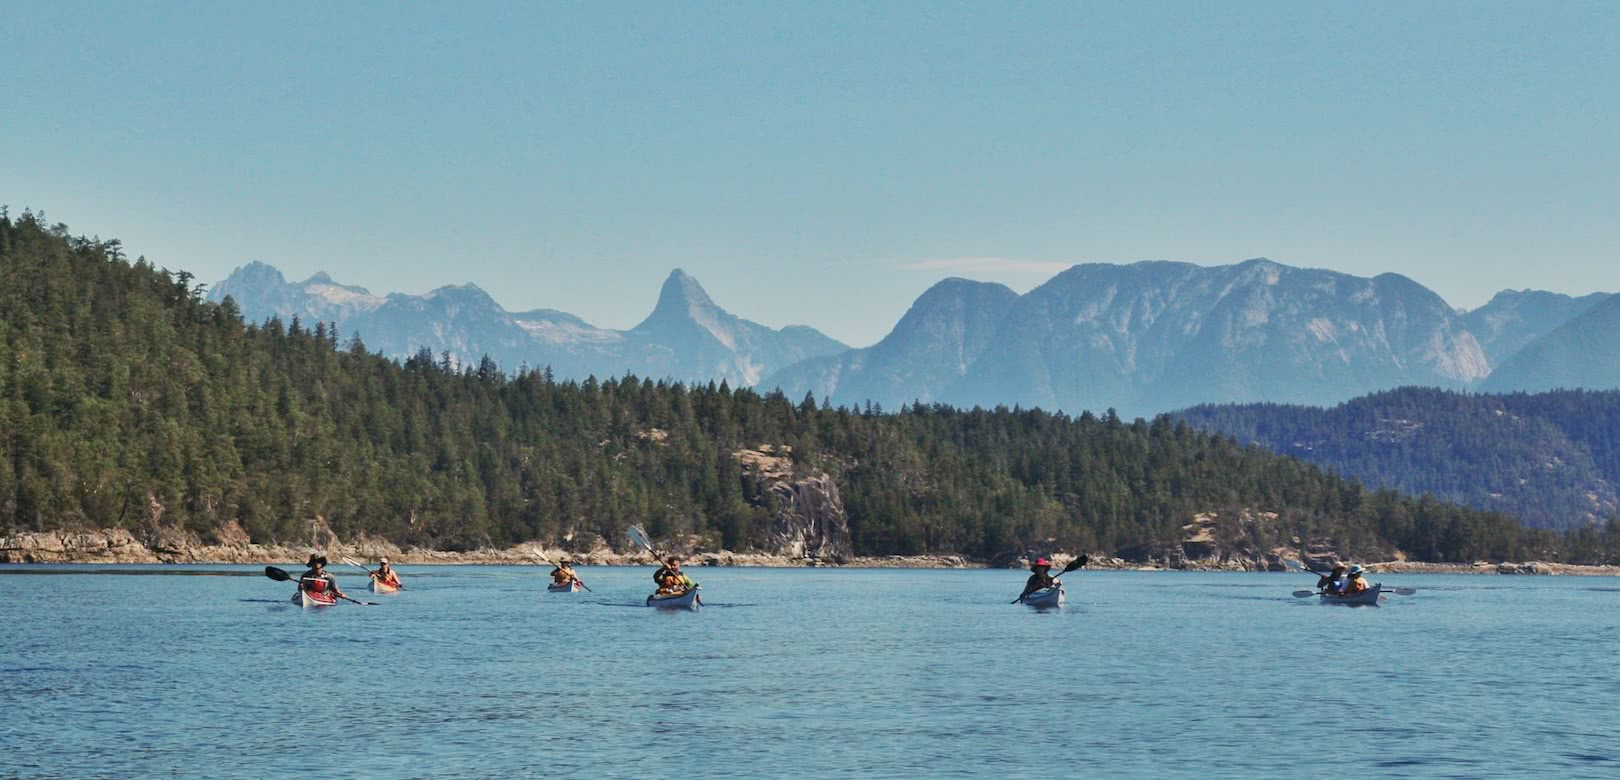 Desolation Sound is one of British Columbia's premier kayak destinations